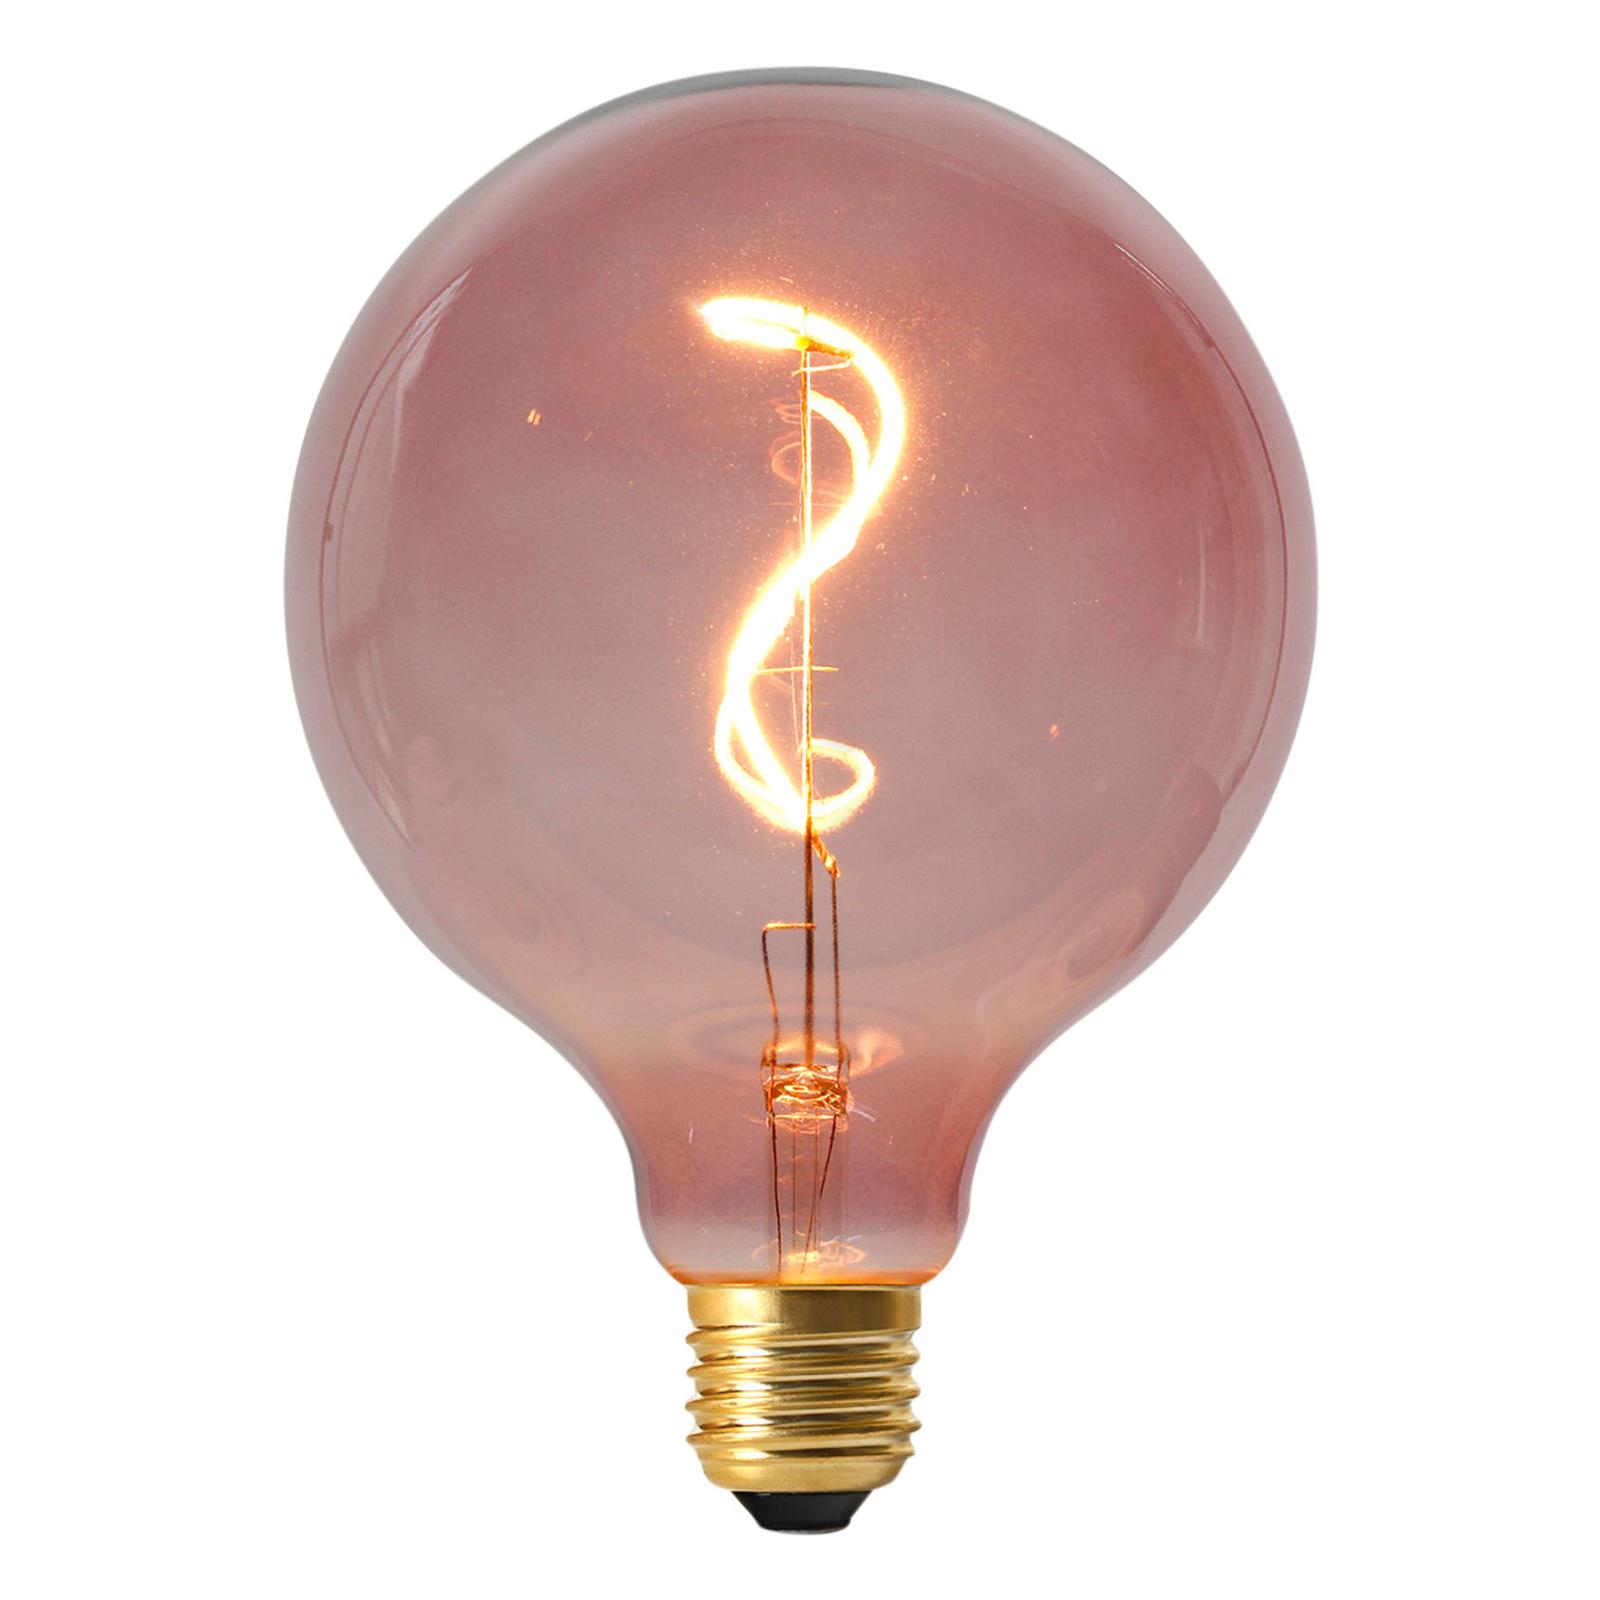 LED-Globelampe Dilly E27 4W 2000K dimmbar, rot